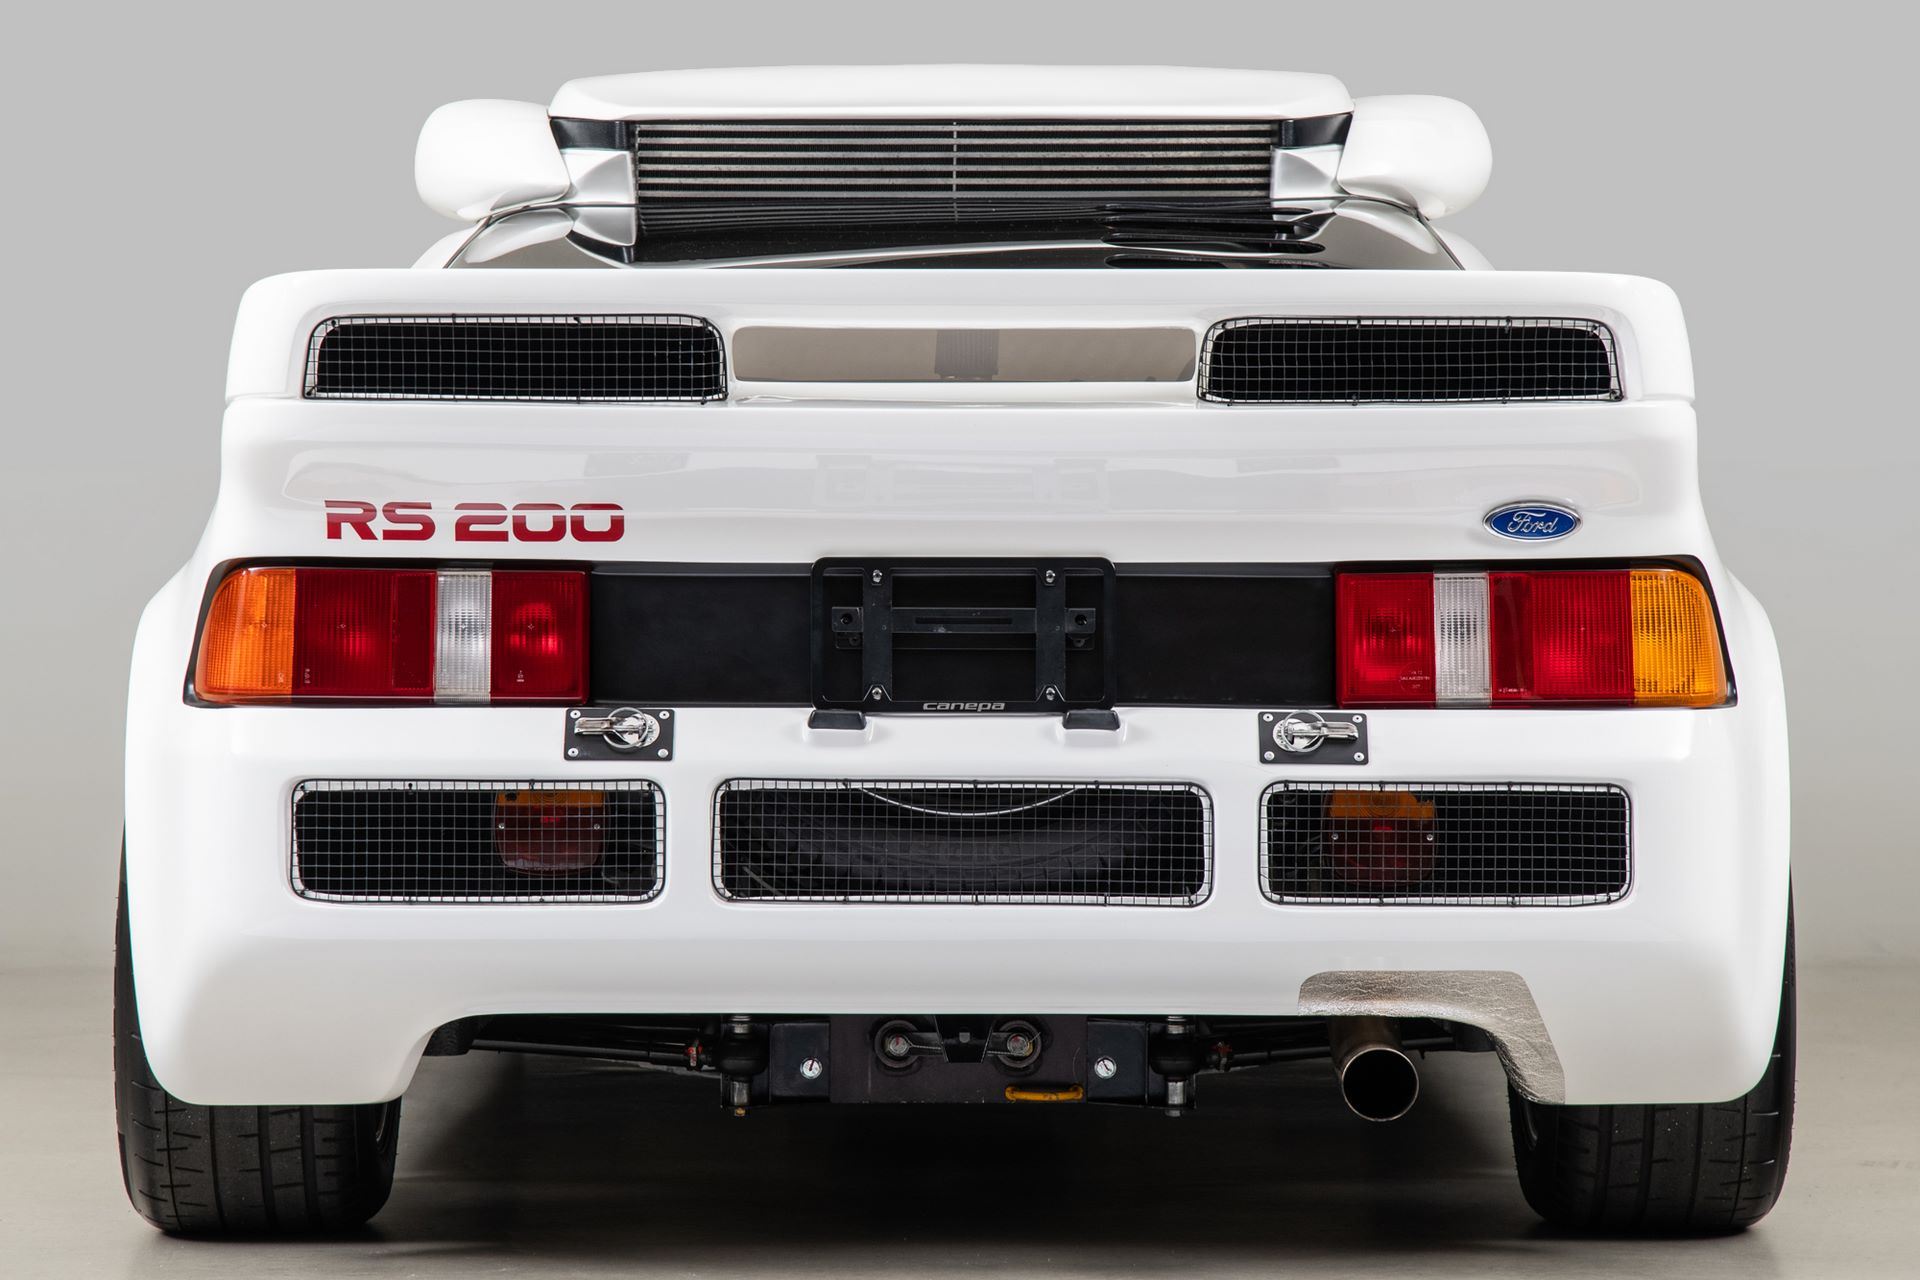 Ford-RS200-Evolution-Evo-for-sale-15